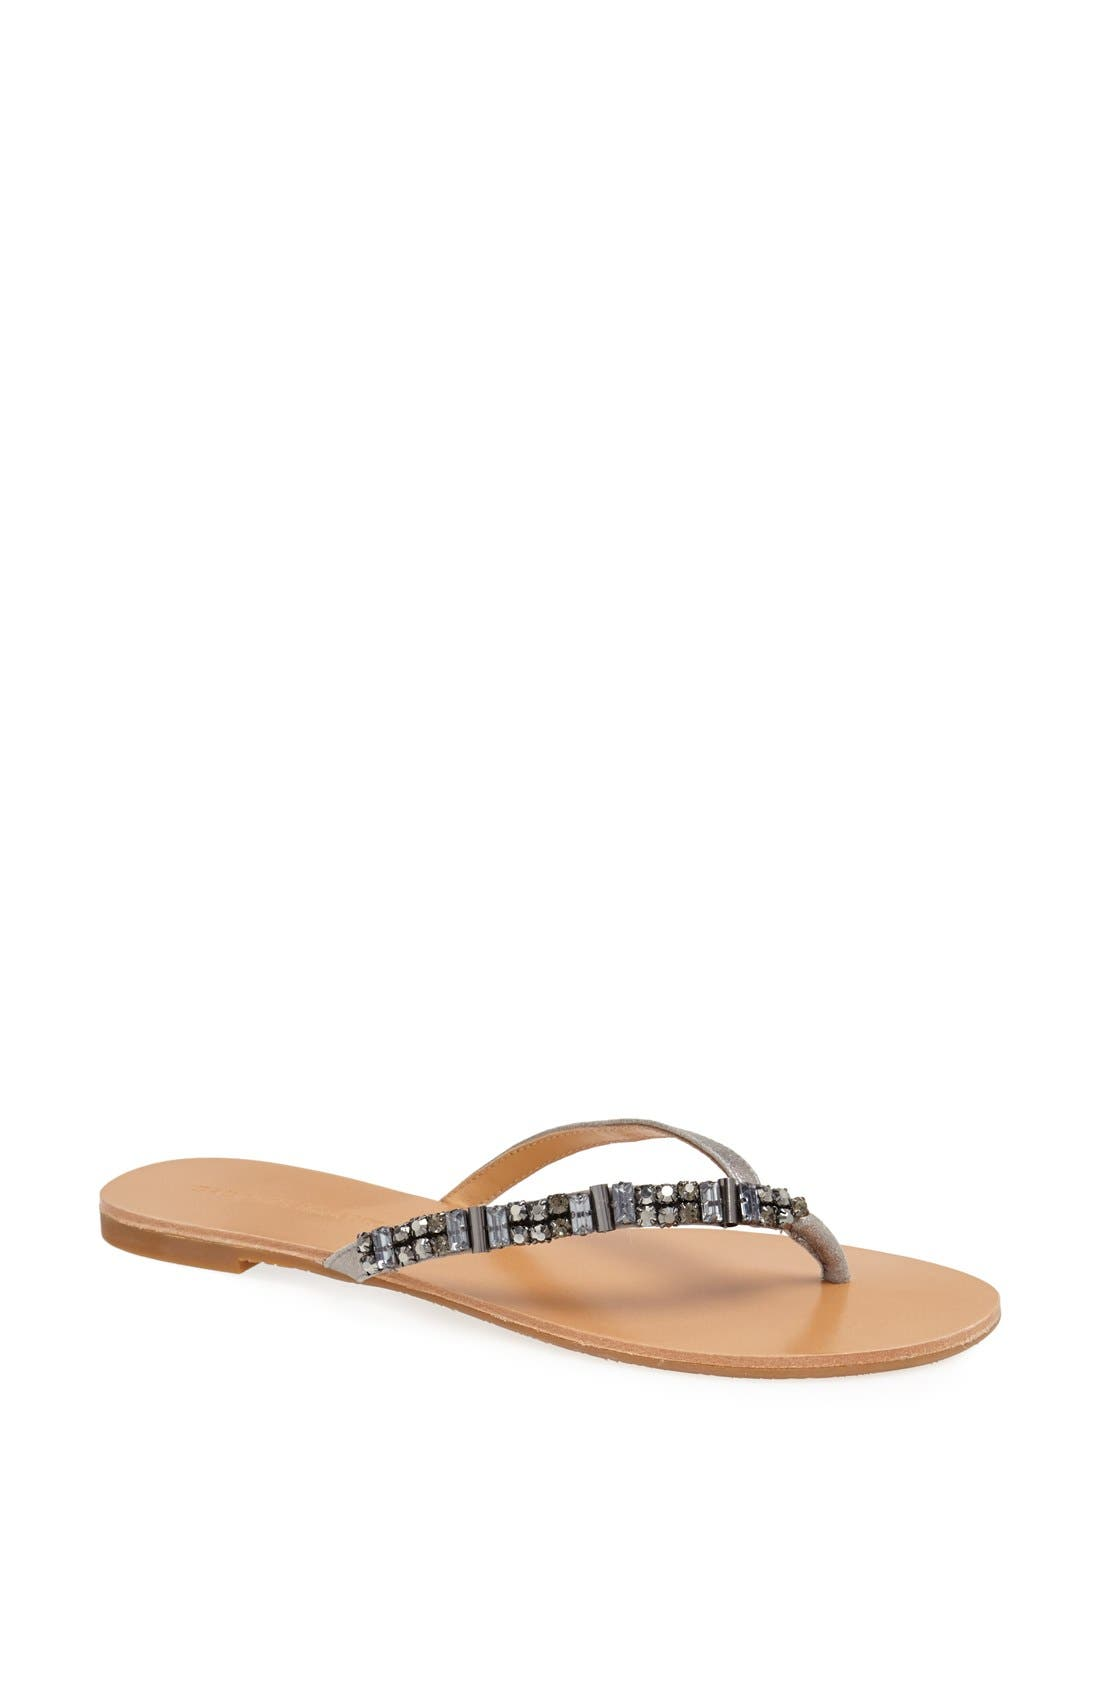 Alternate Image 1 Selected - Badgley Mischka 'Kamryn' Thong Sandal